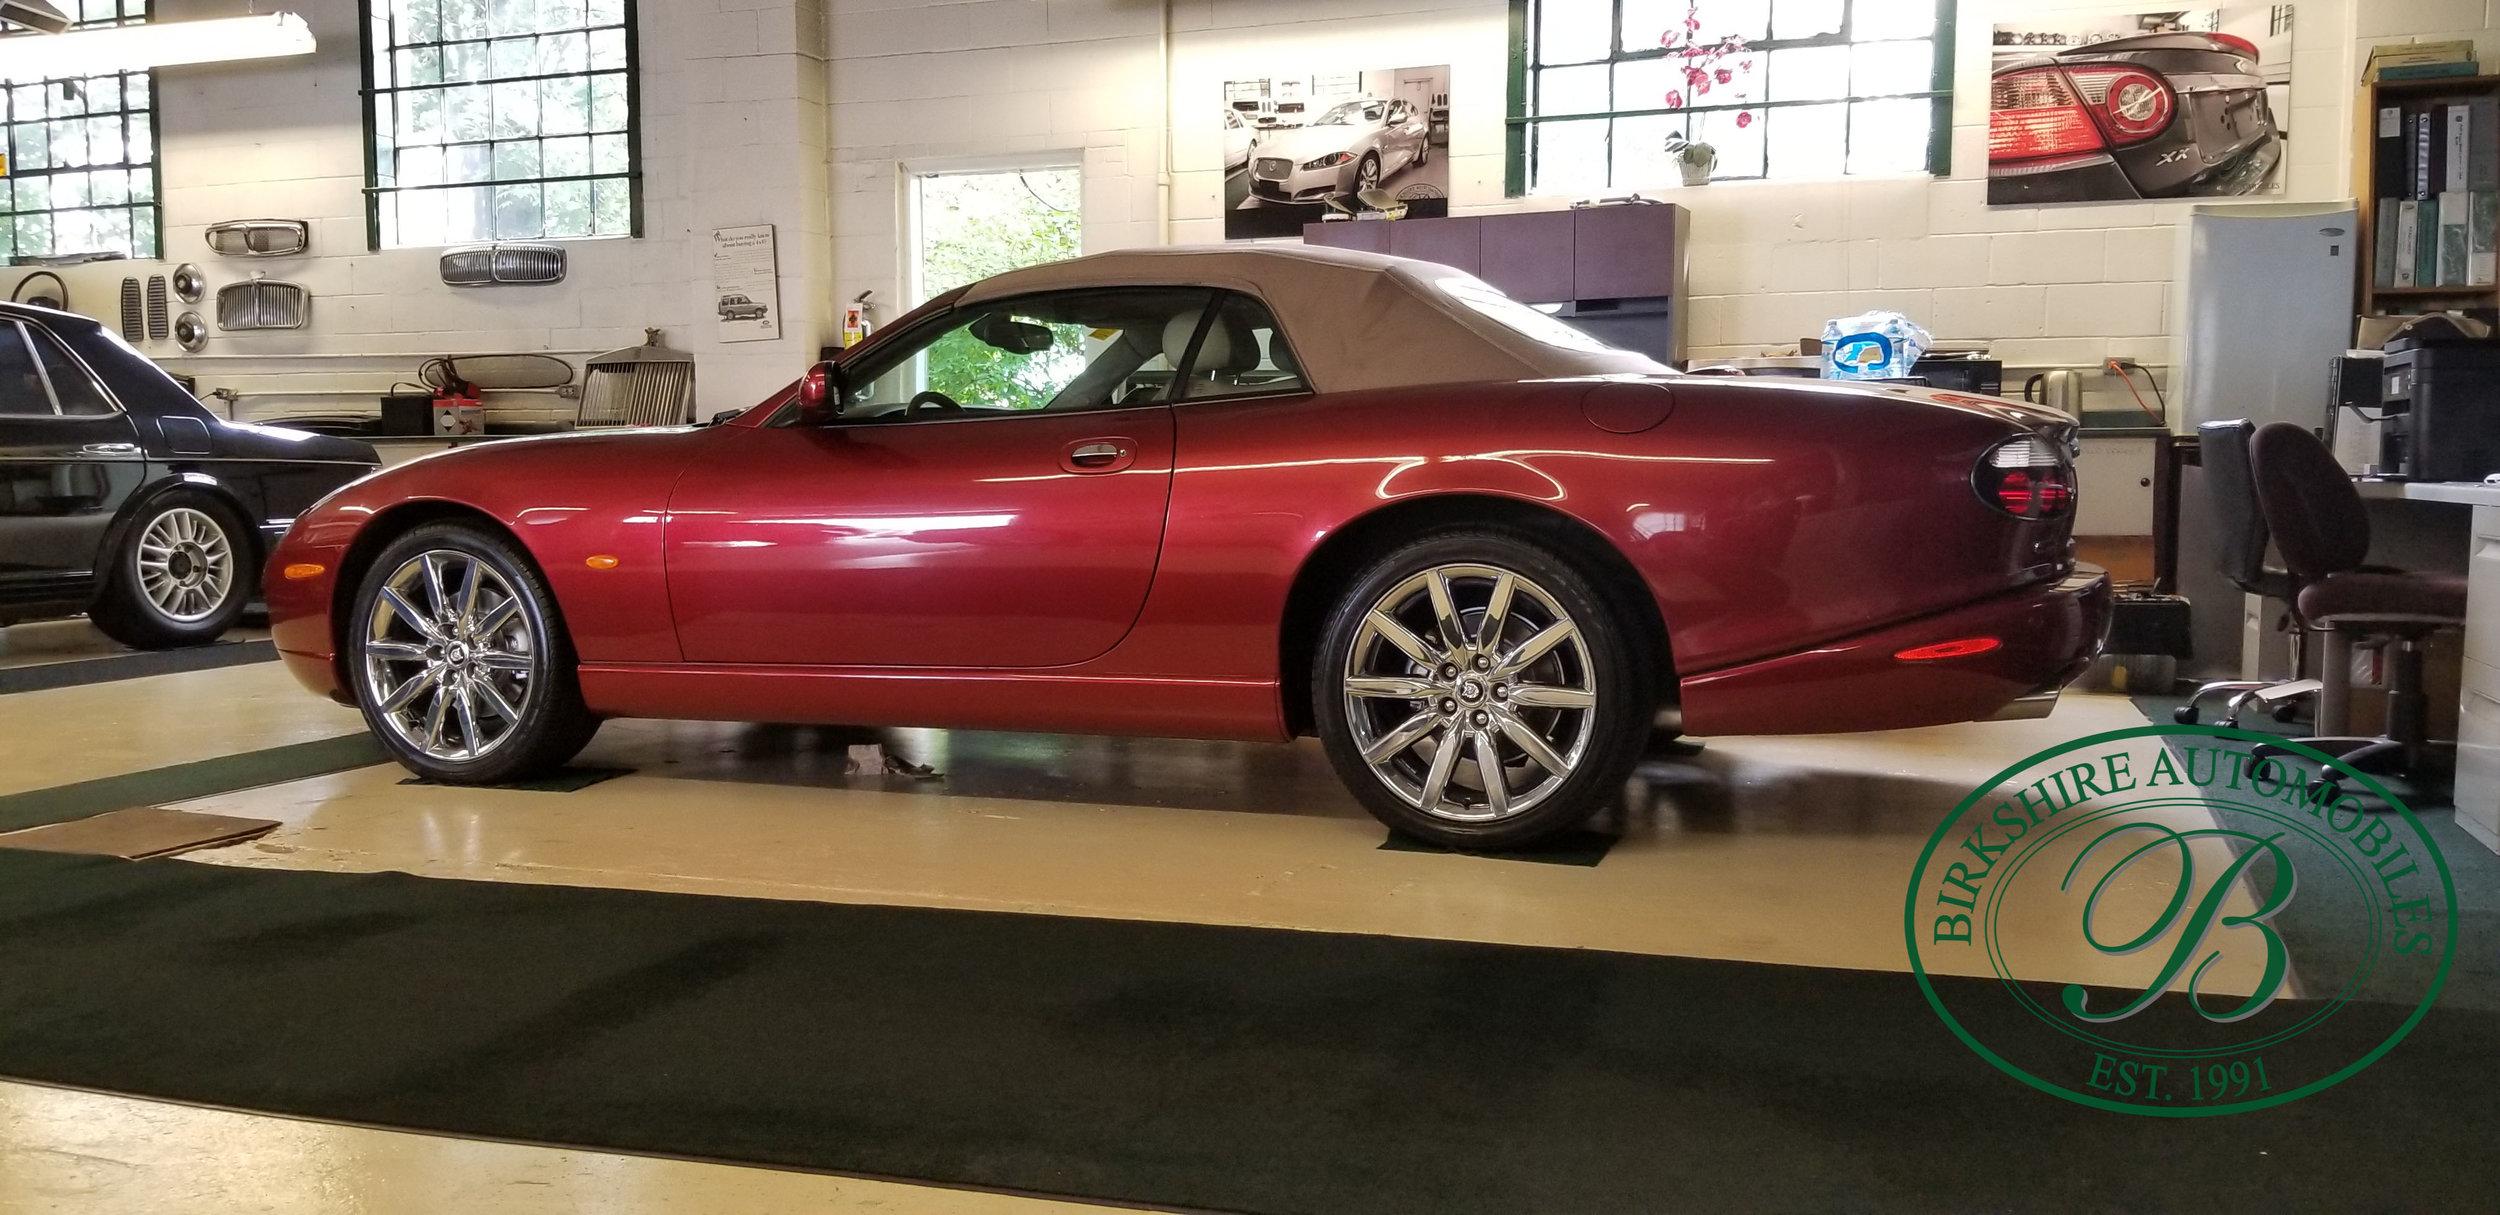 2006 Jaguar XK8 Convertible - Birkshire Automobiles Thornhill (62).jpg